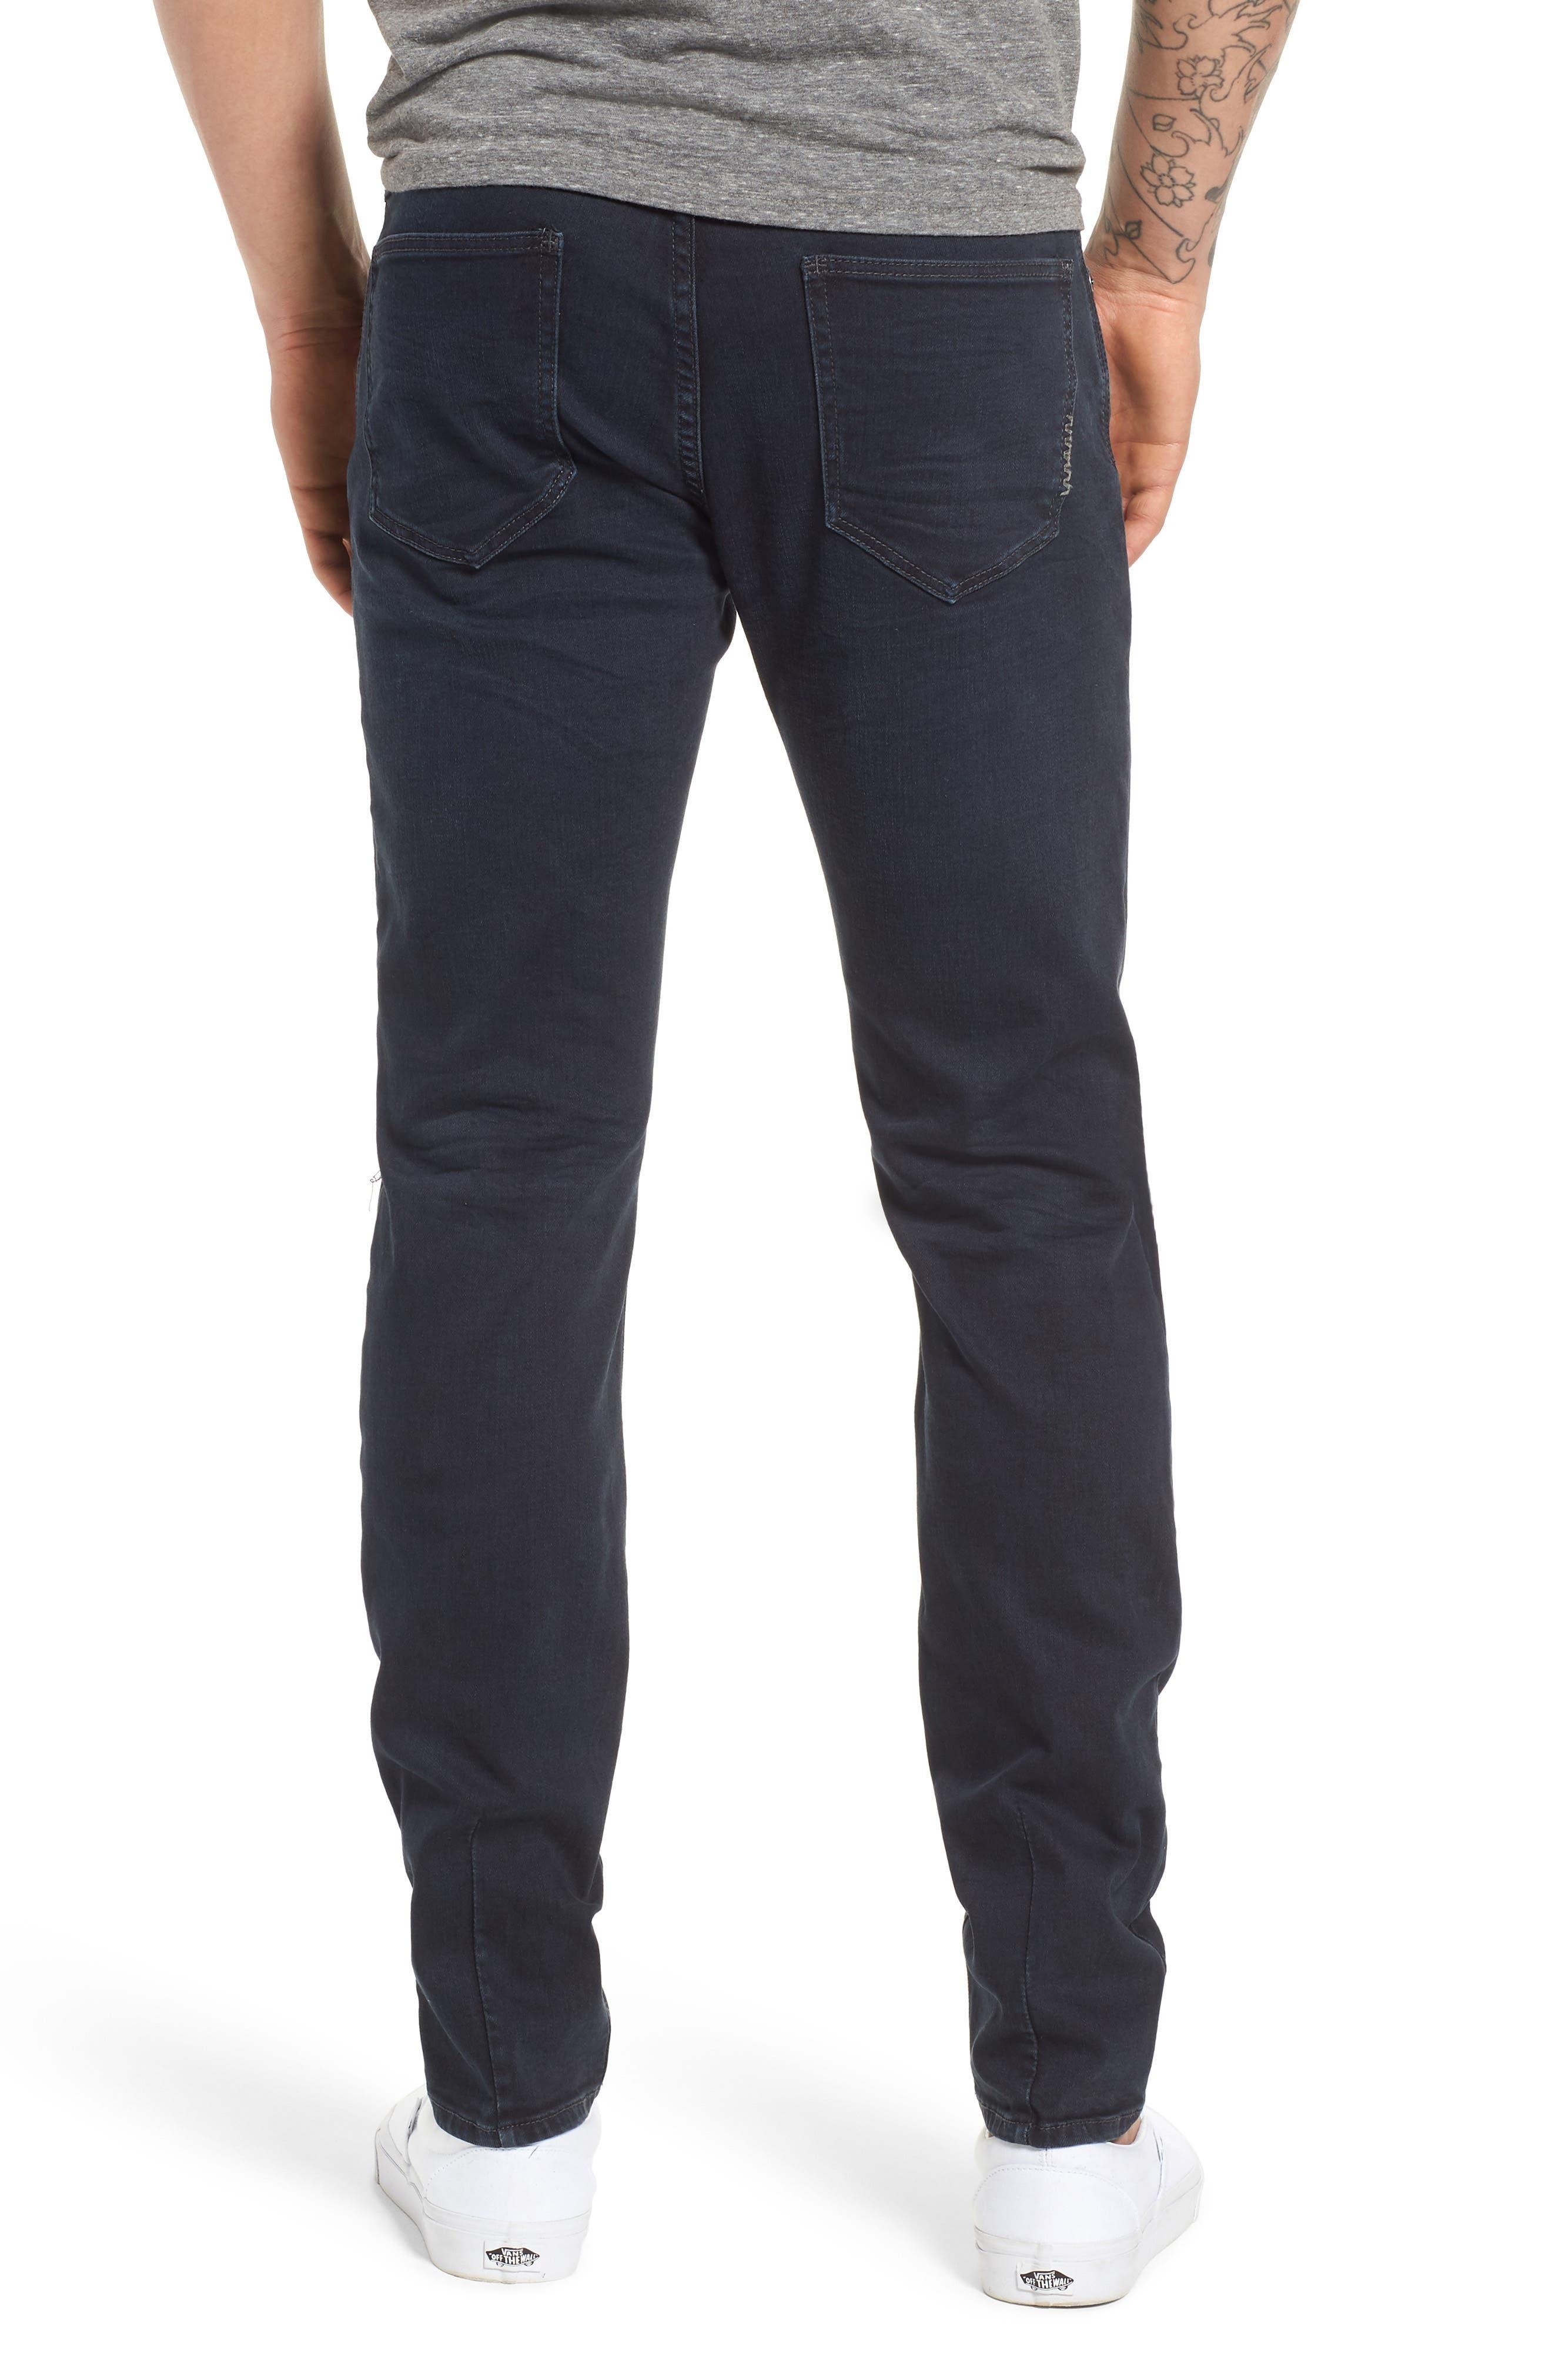 Iggy Skinny Fit Jeans,                             Alternate thumbnail 2, color,                             Blue Lines Broken